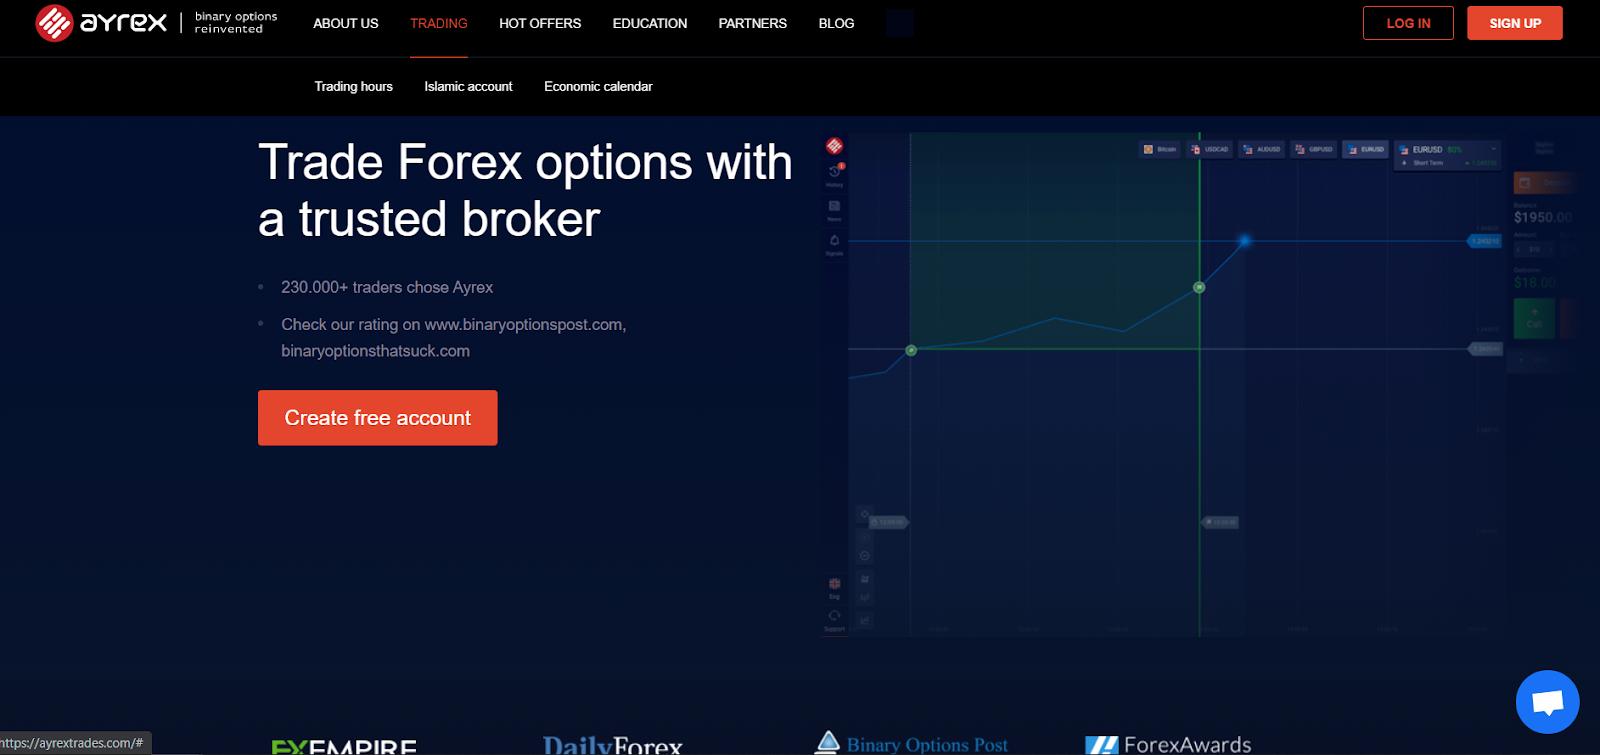 Ayrex demo account registration window